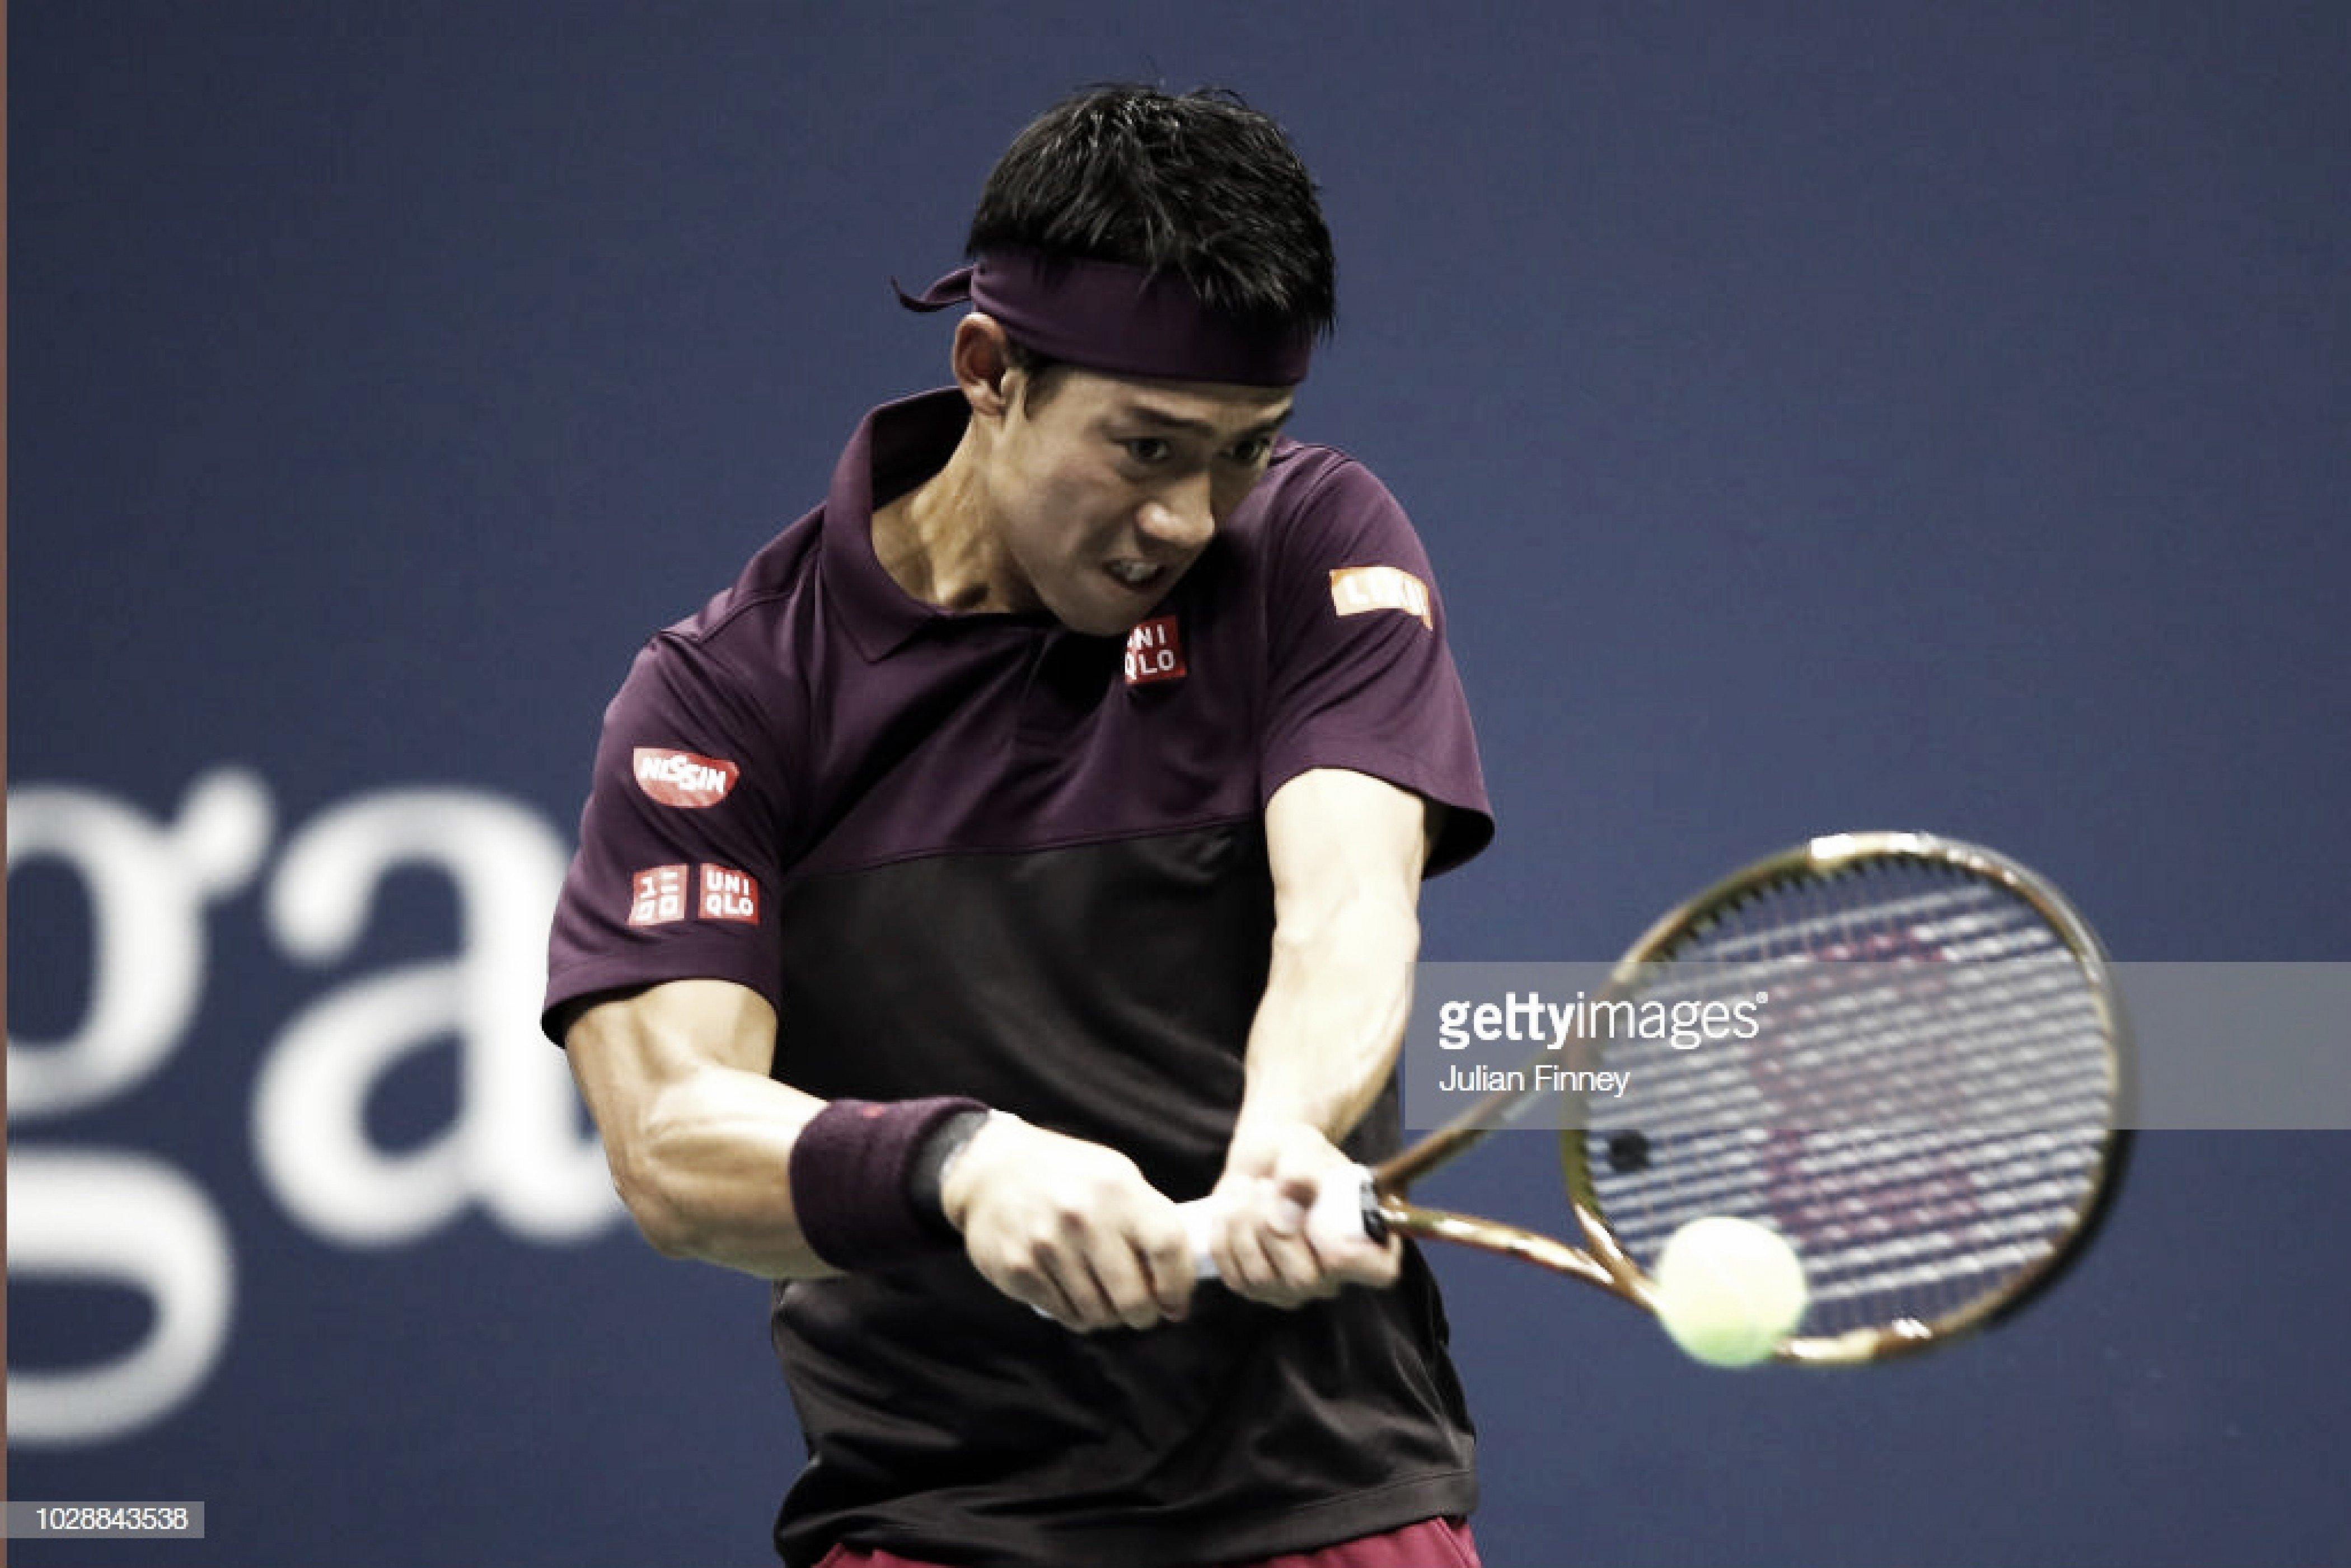 Nishikori destrona al campeón en Metz